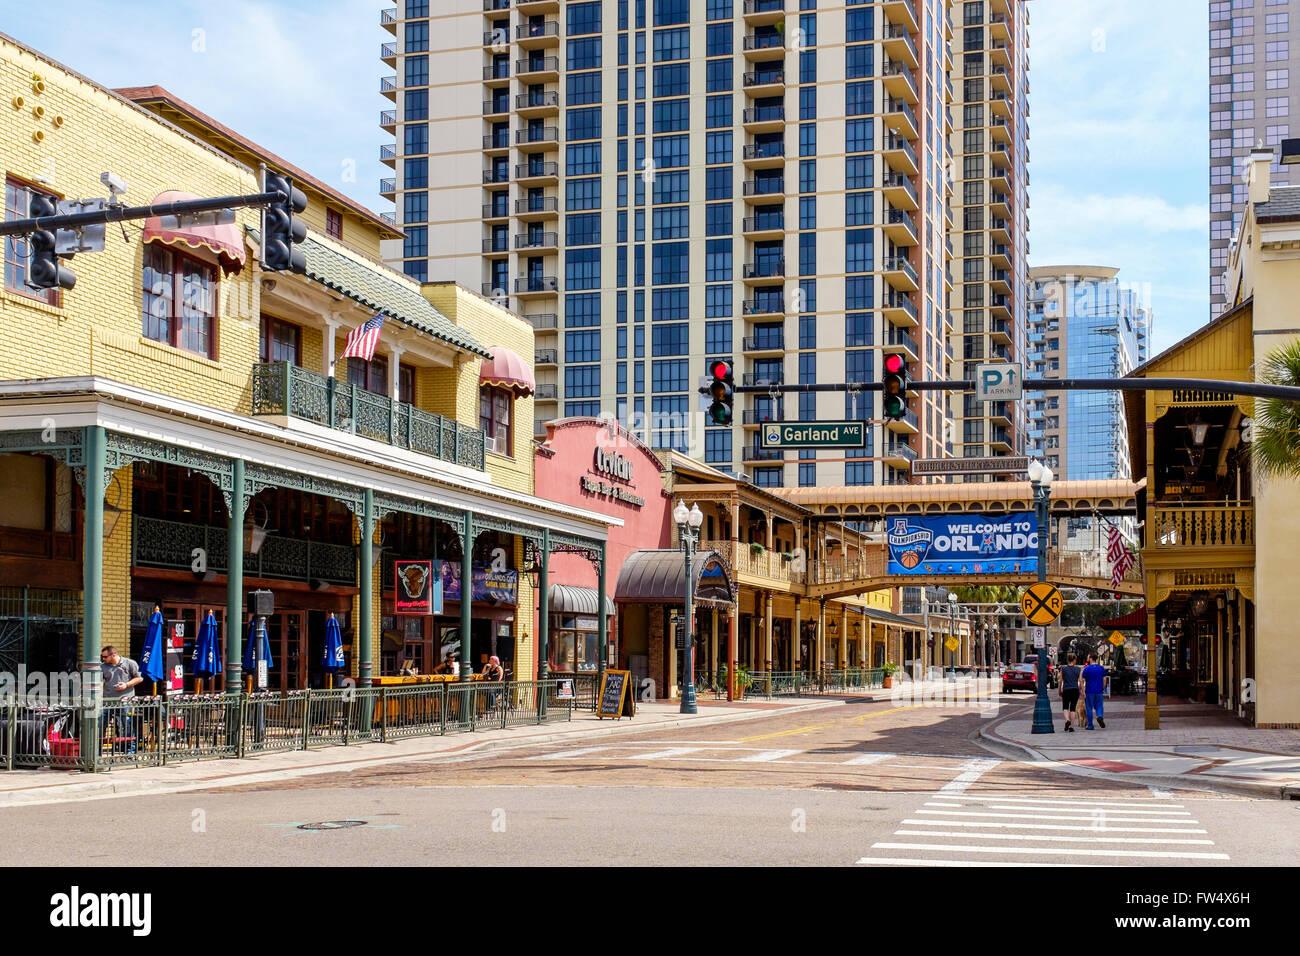 Church Street, Downtown Orlando, Florida, America Stock